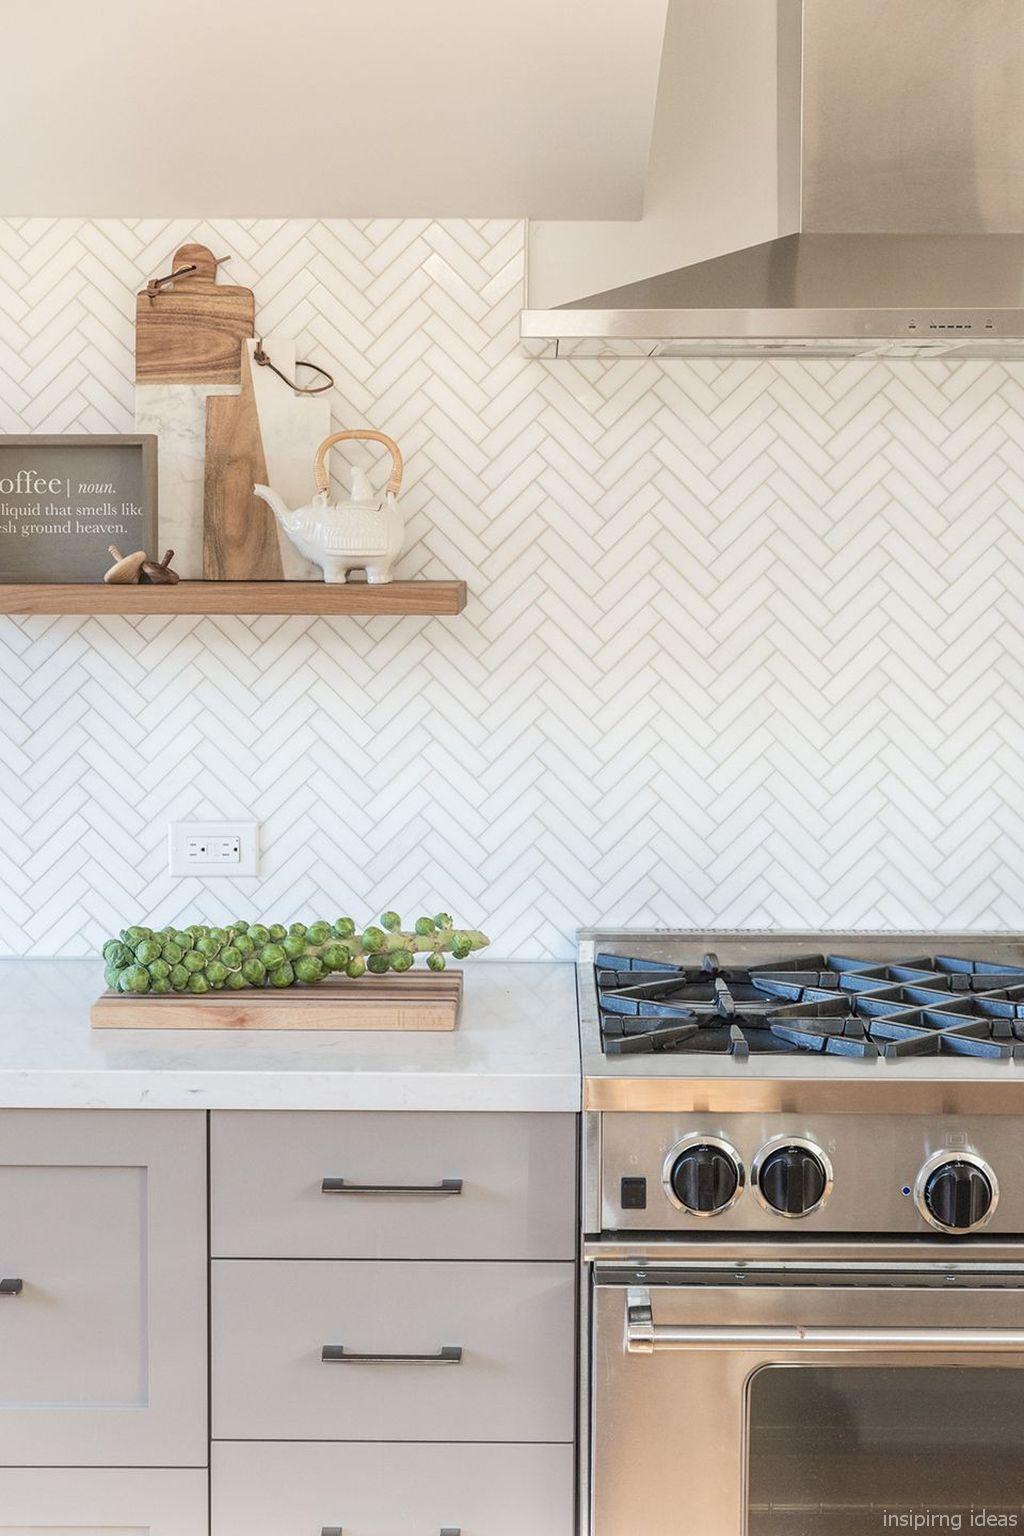 Adorable 80 Beautiful Modern Farmhouse Kitchen Backsplash Ideas Https Lovelyvin Kitchen Backsplash Designs Modern Kitchen Backsplash Kitchen Splashback Tiles